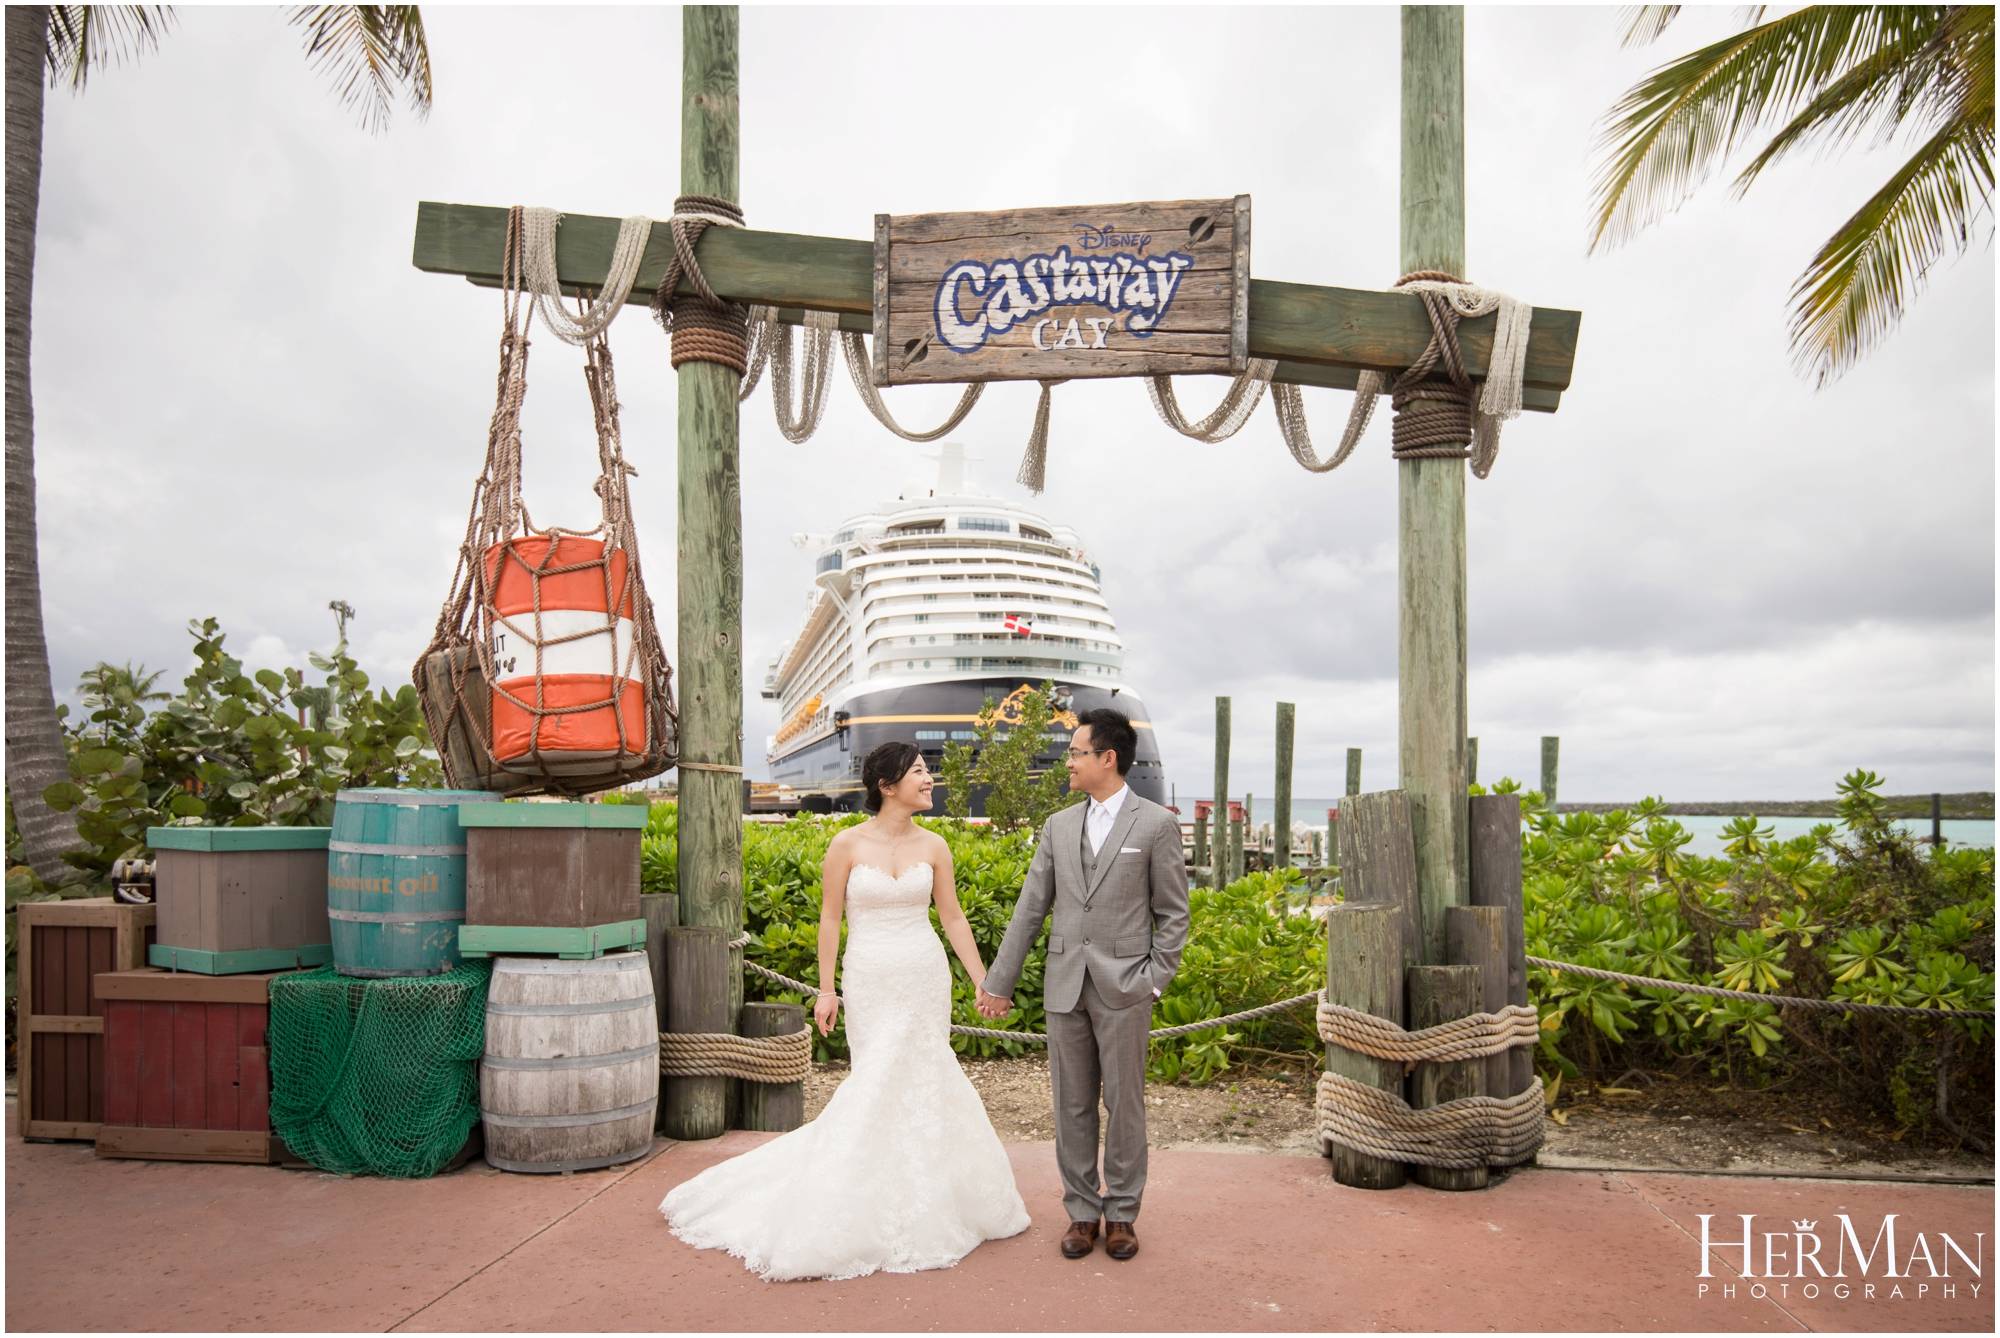 disney-fantasy-cruise-wedding-HerMan-photography_0044.jpg